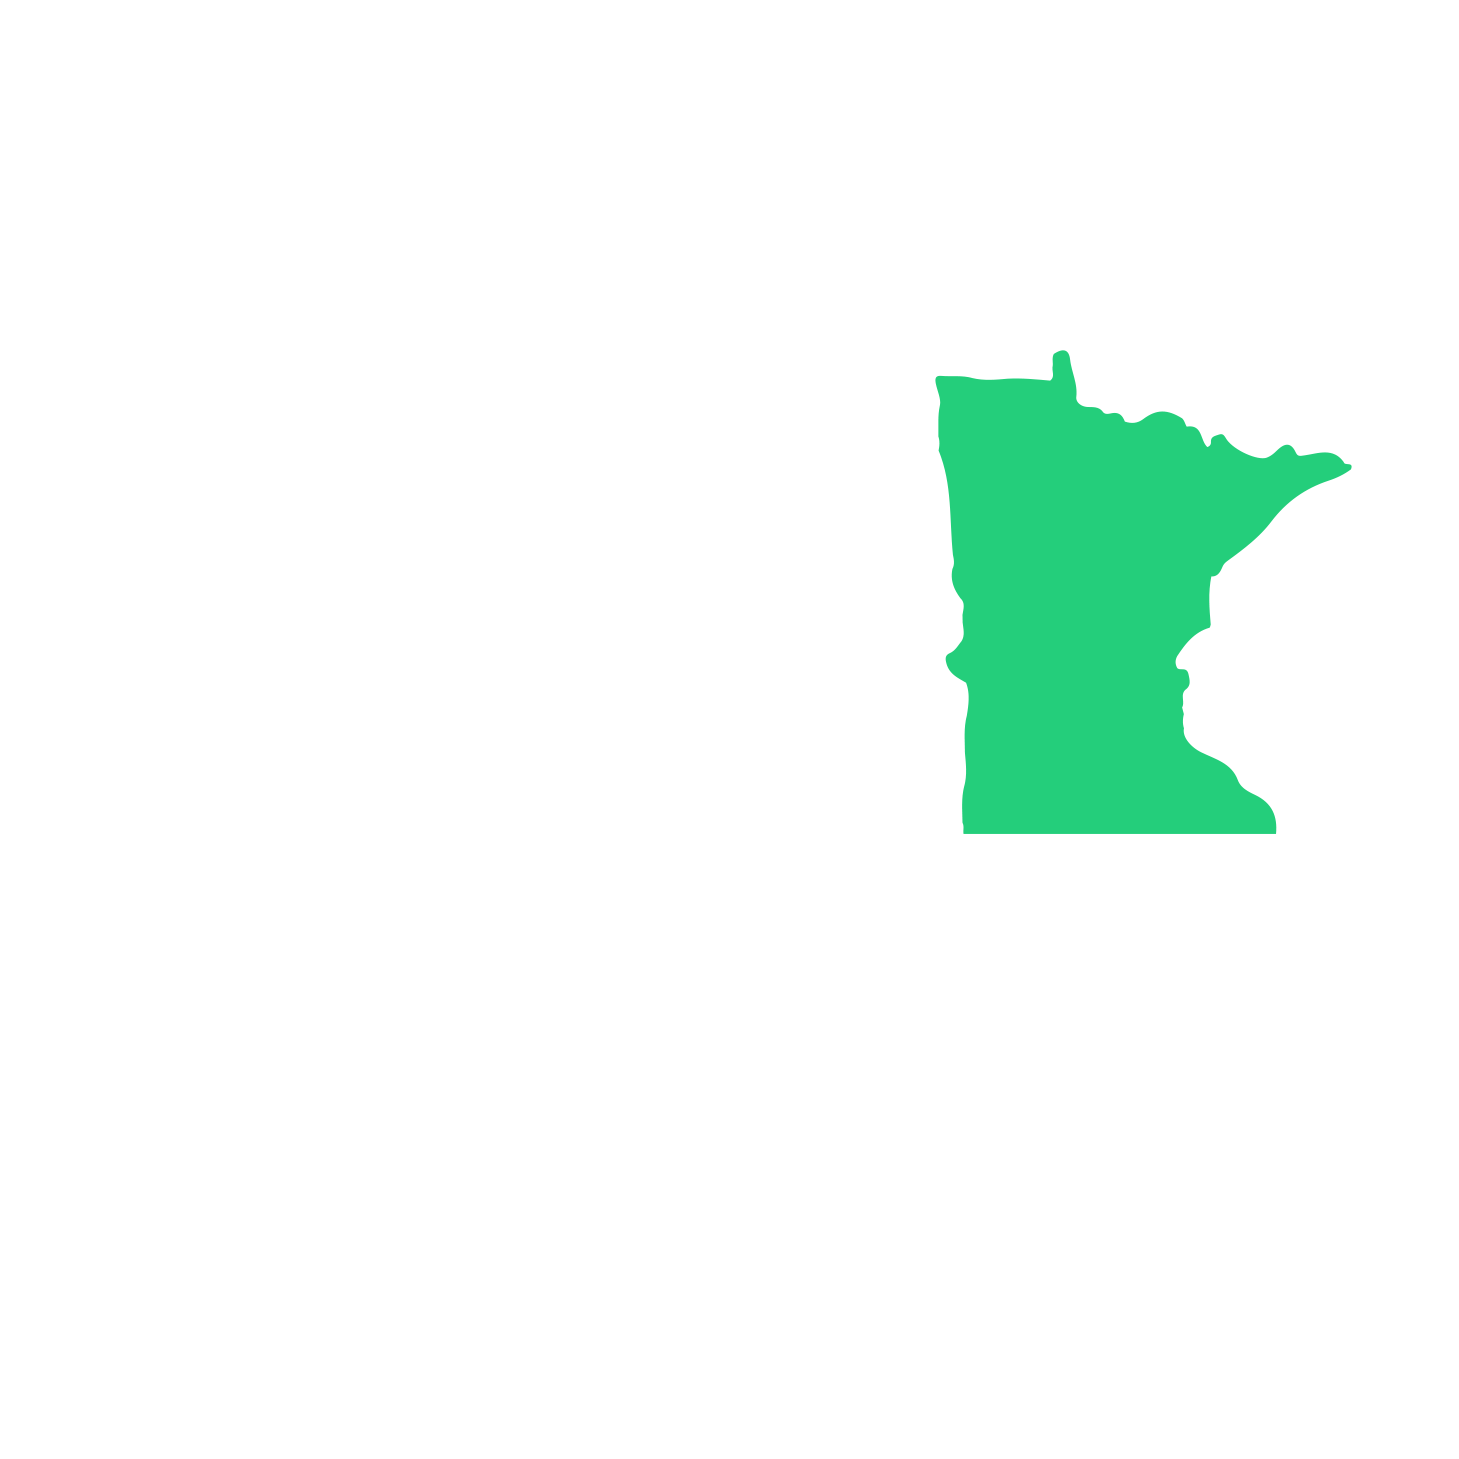 Minnesota Financial Resources